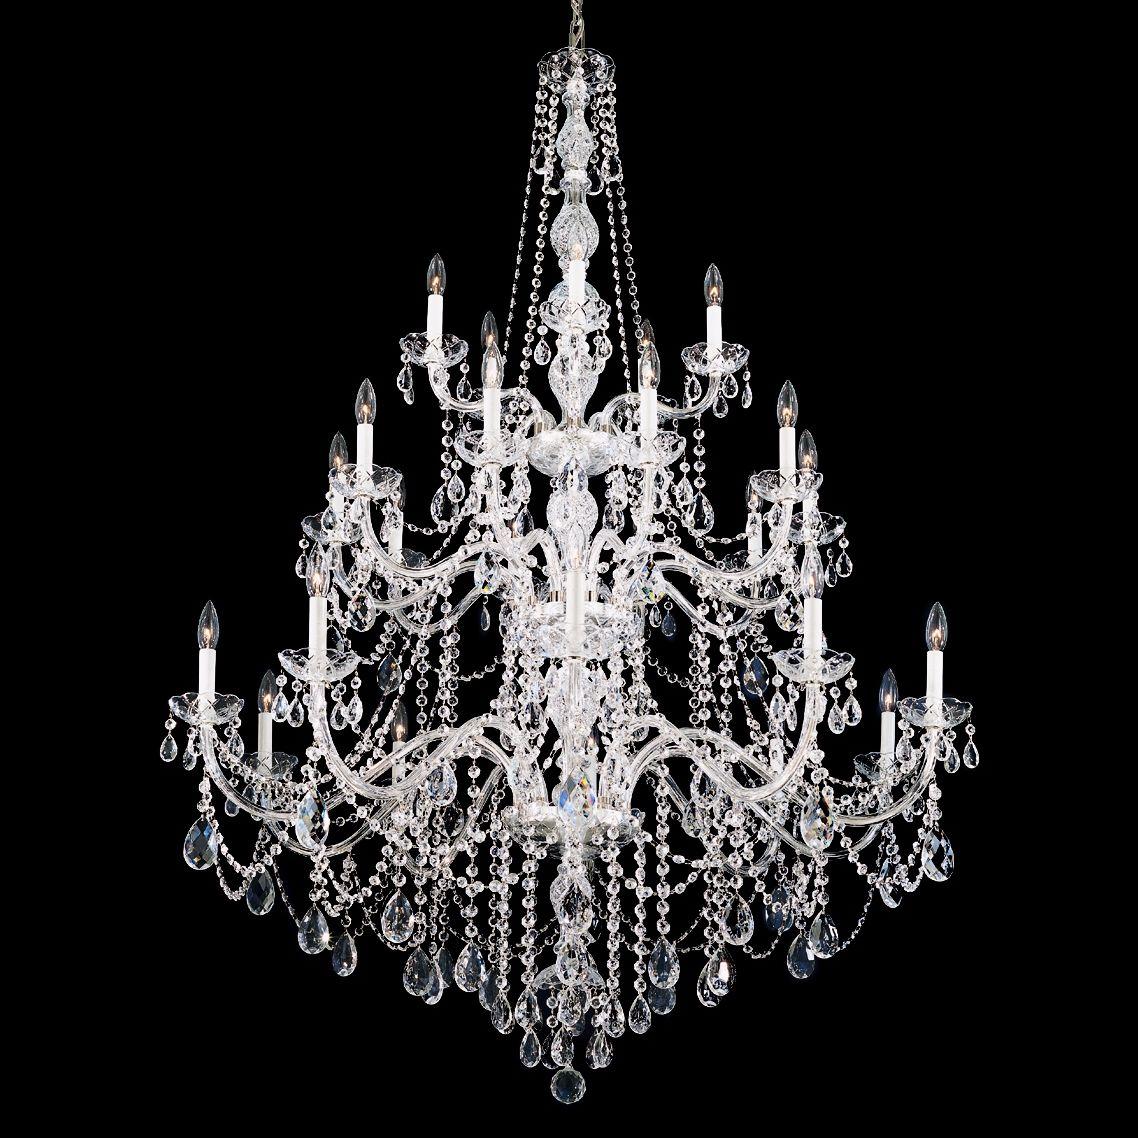 Schonbek Arlington Collection 25 Light Crystal Chandelier